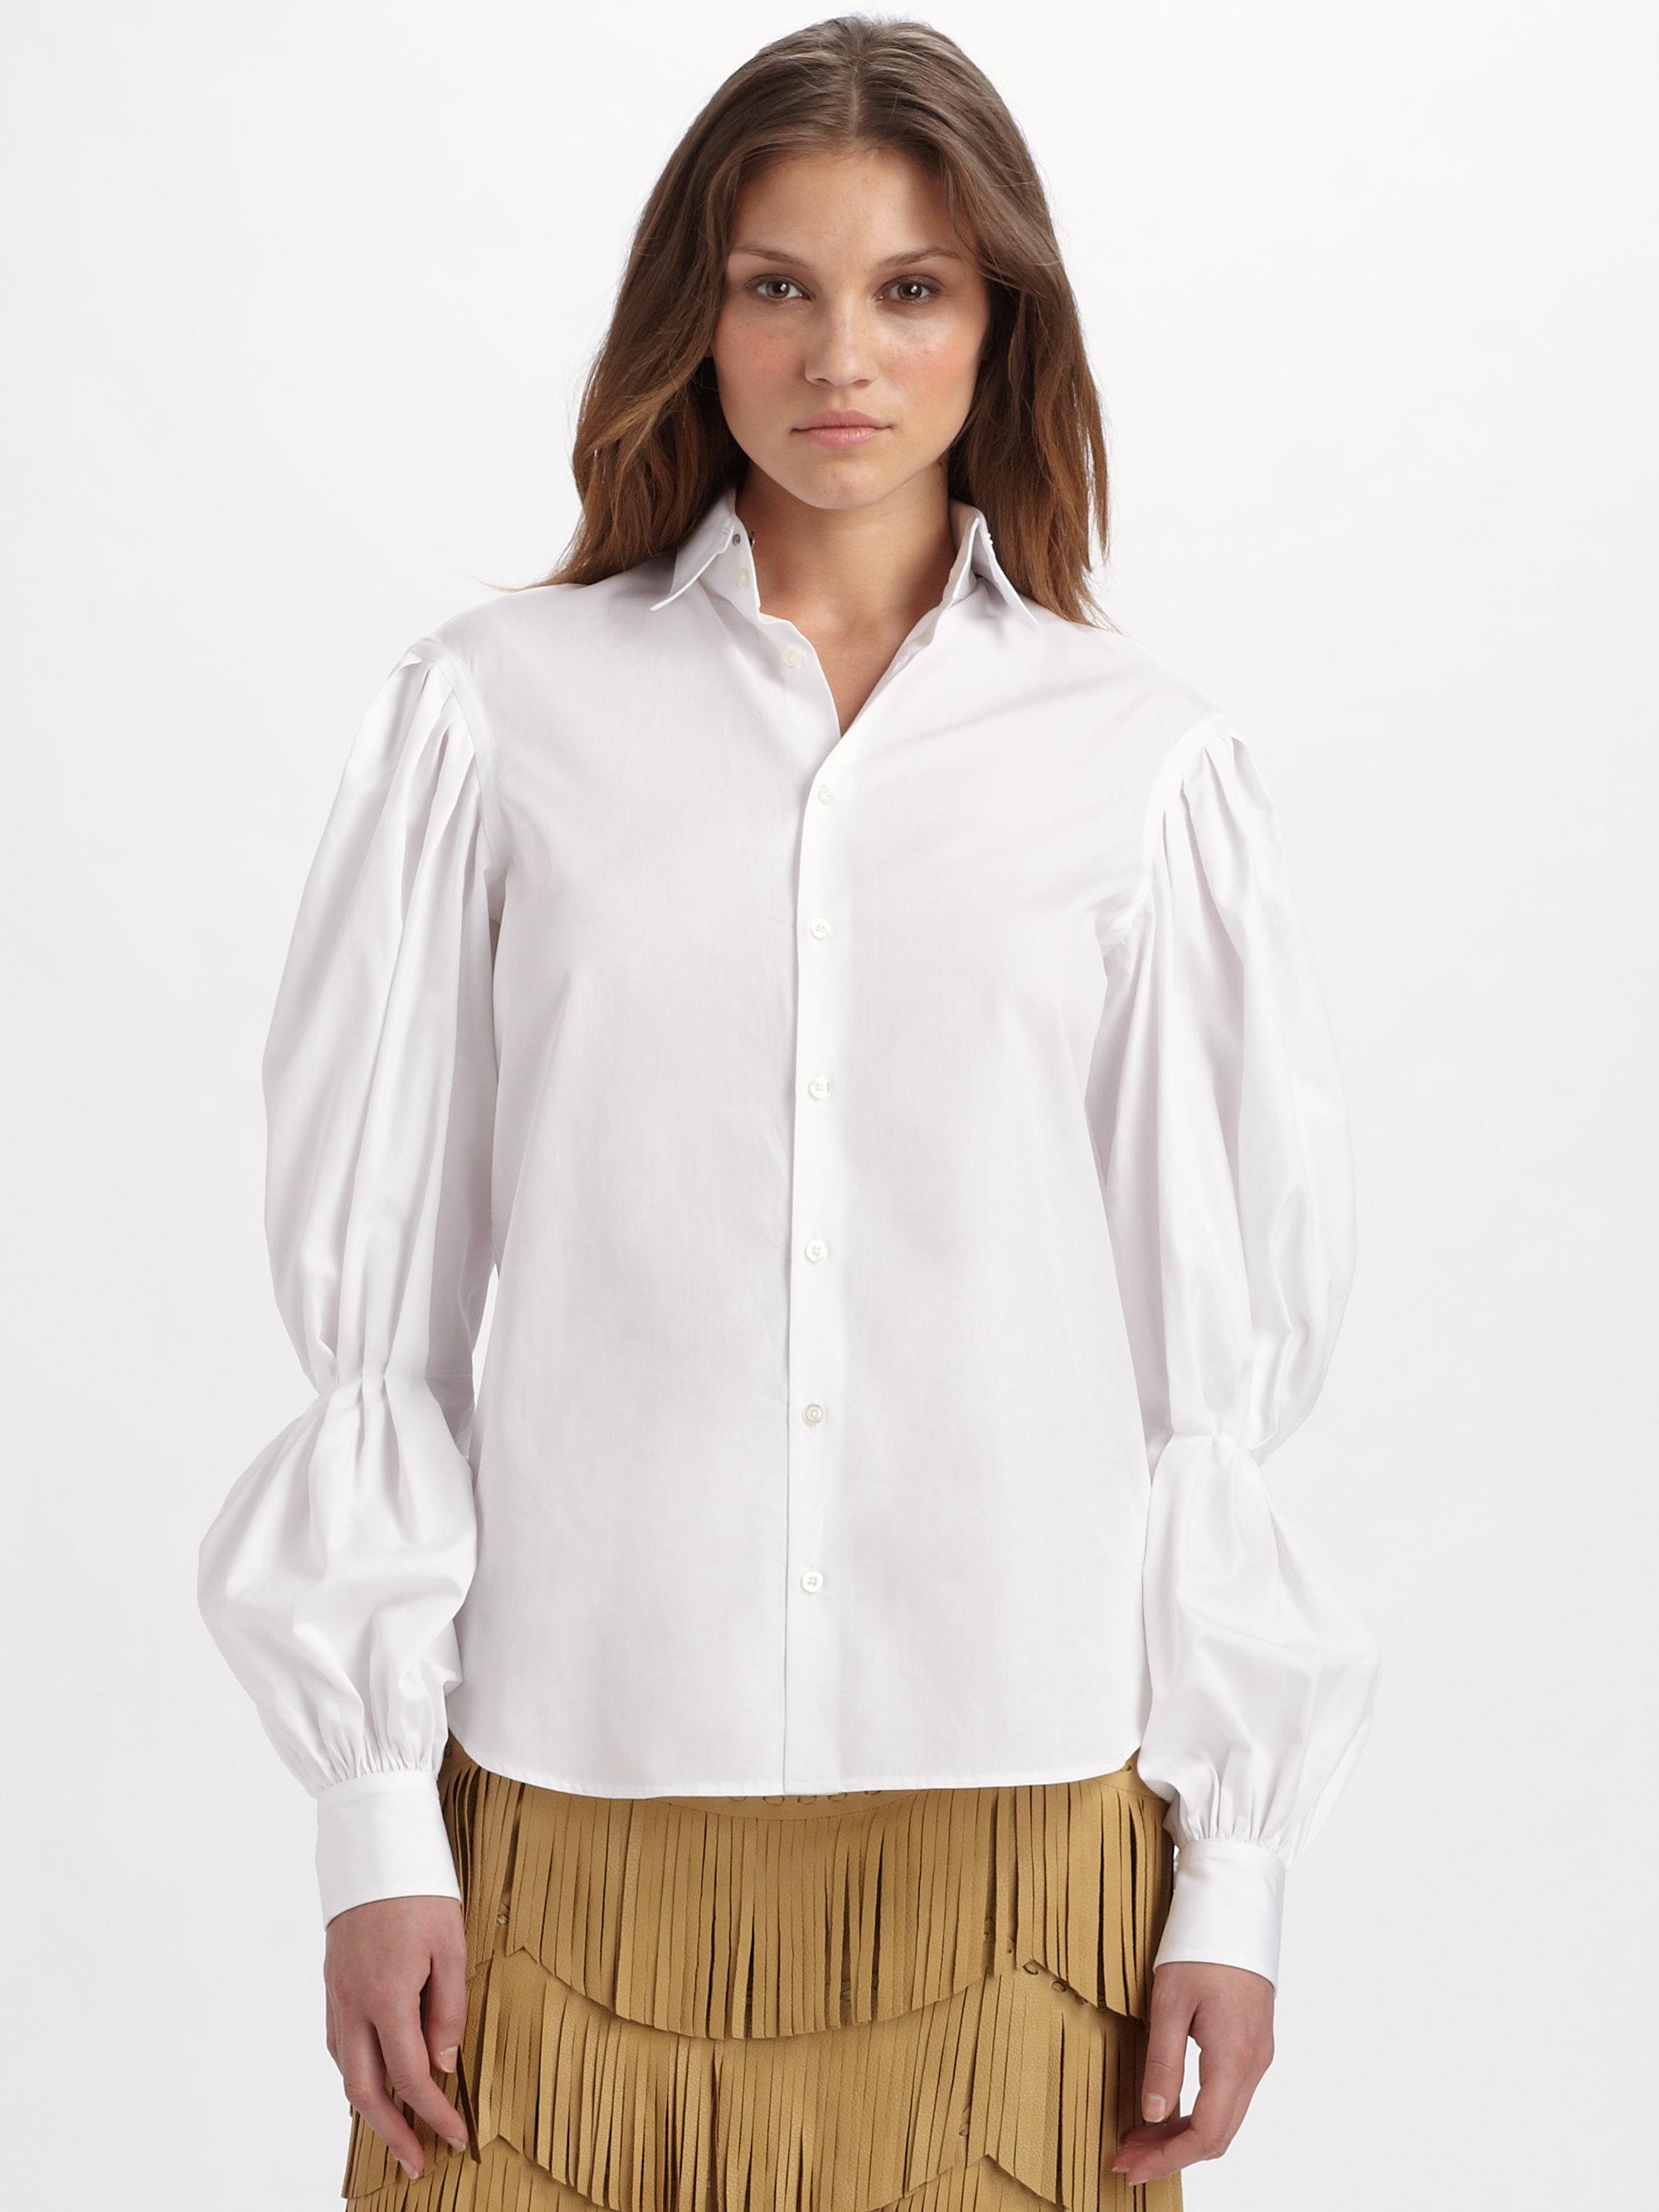 lyst ralph lauren collection cotton broadcloth desmond